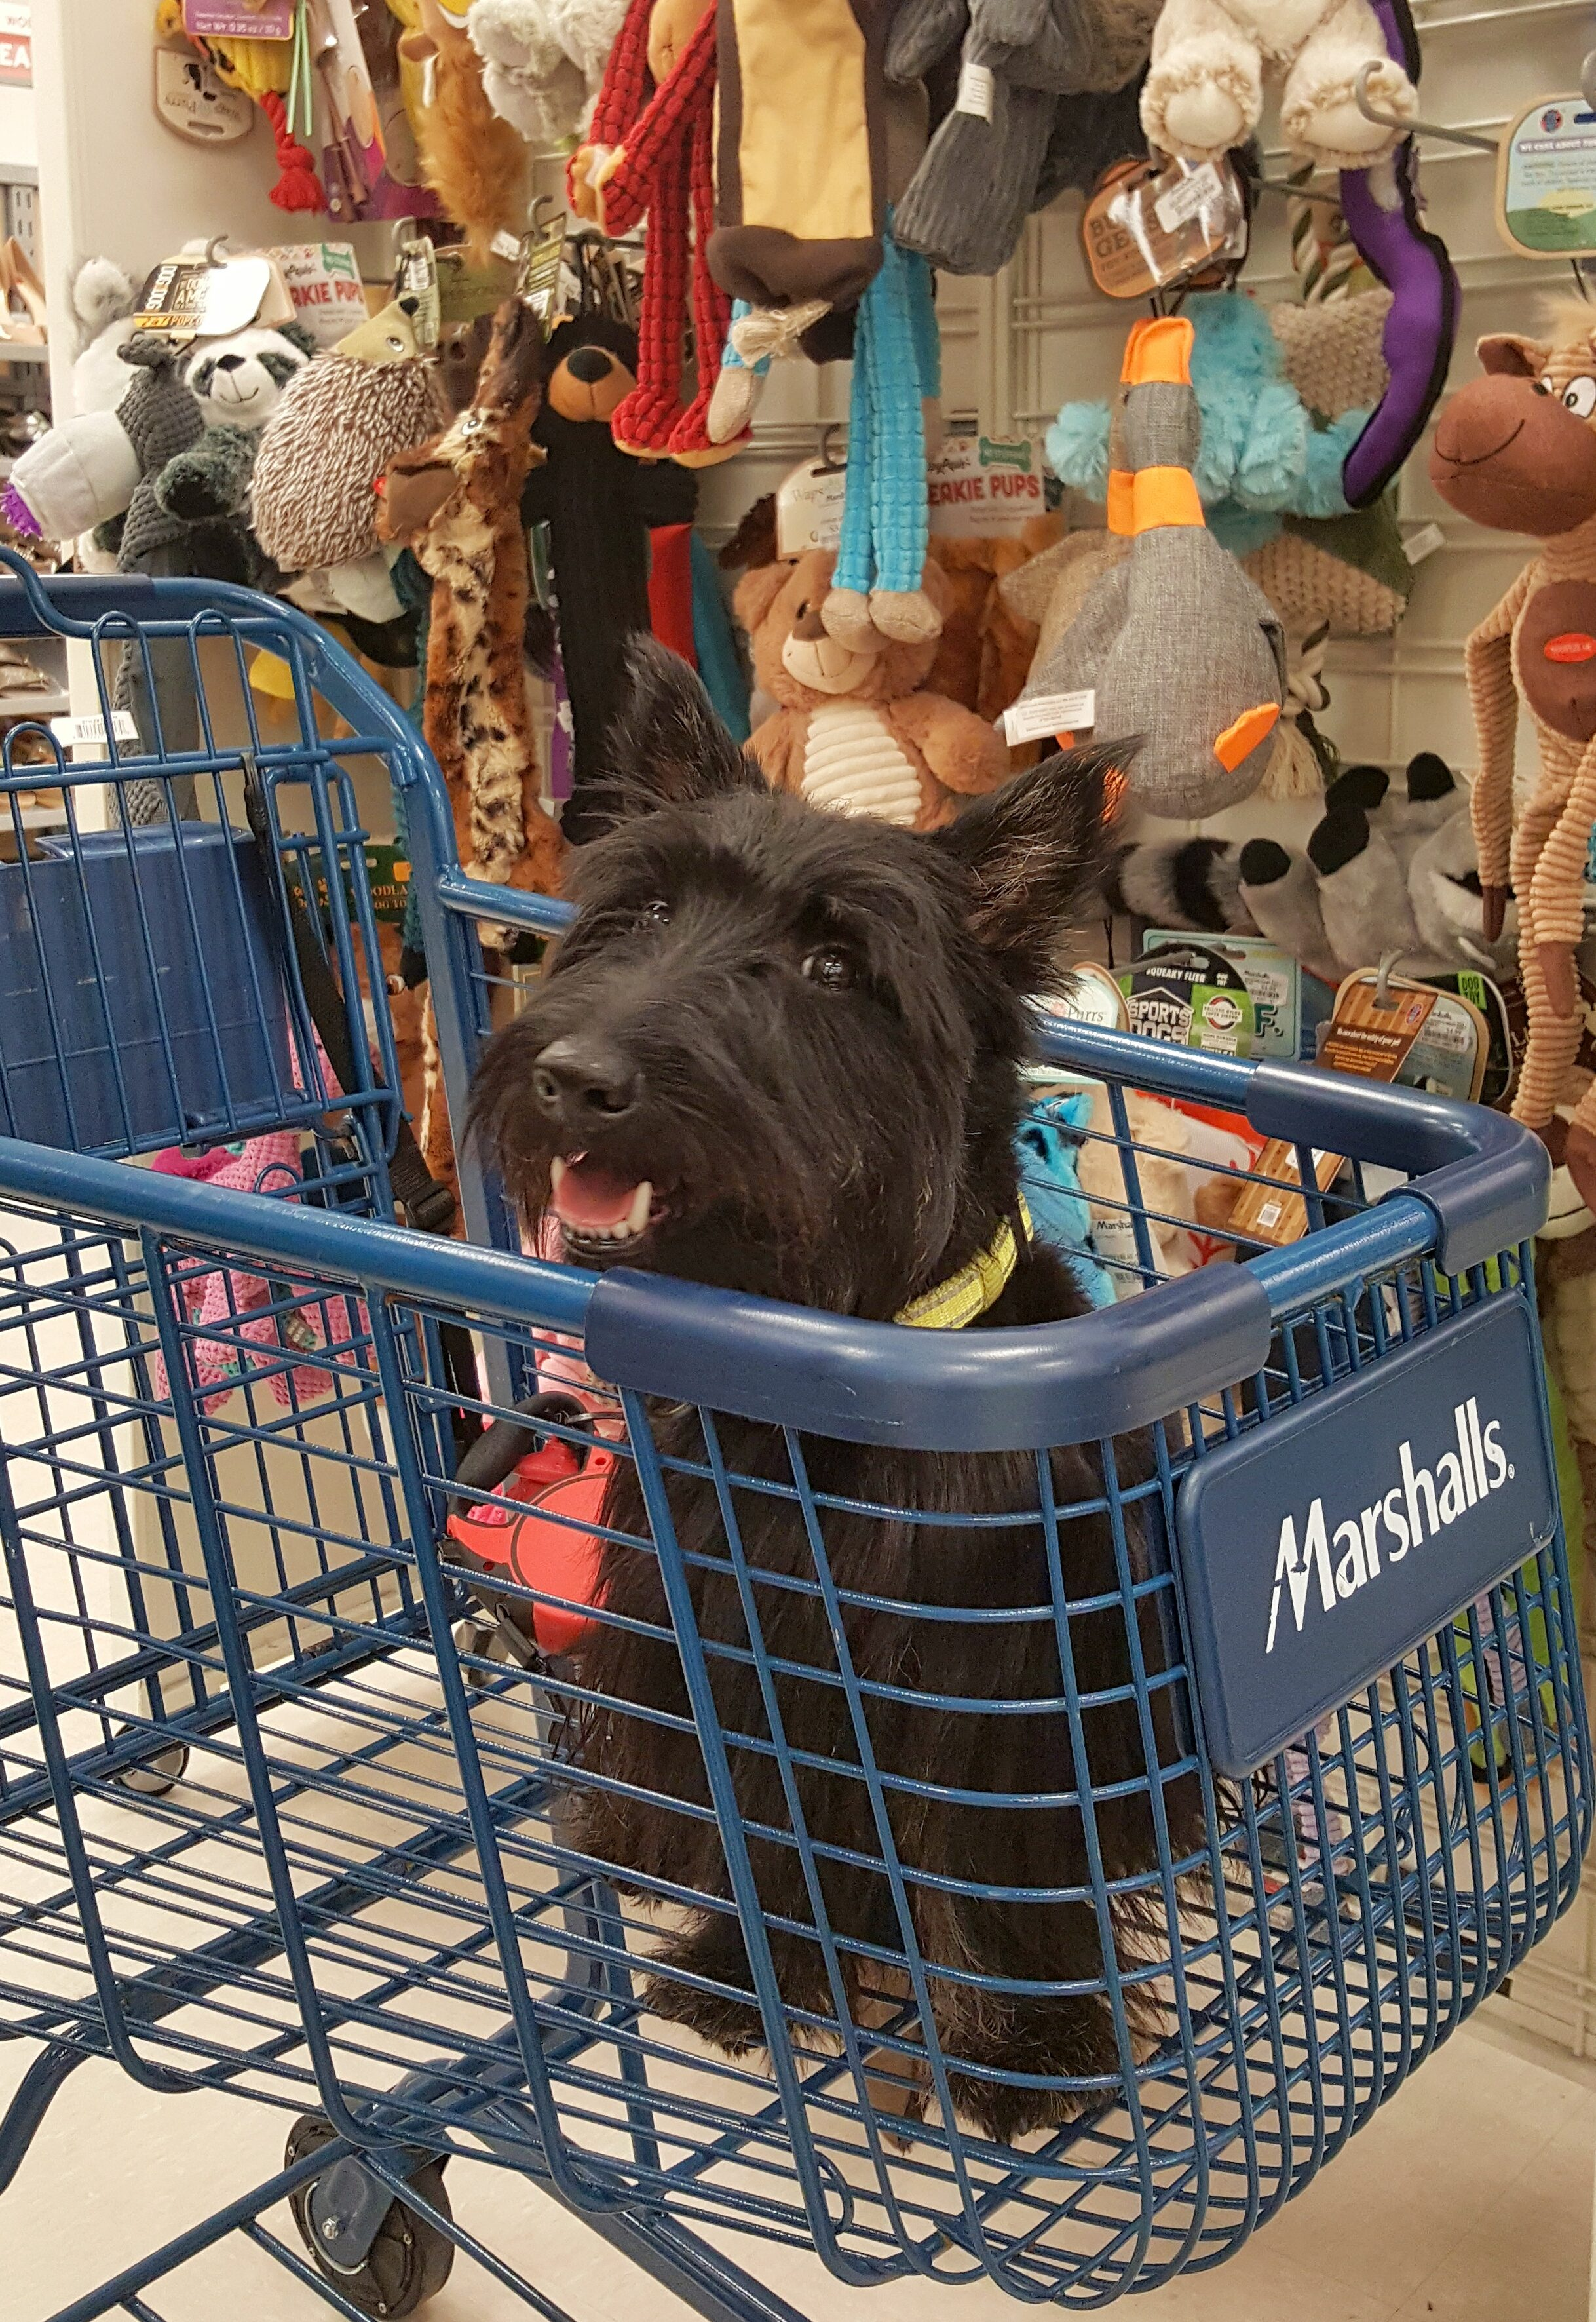 Black Westie dog sitting inside Marshalls shopping cart smiling in front of dog toys